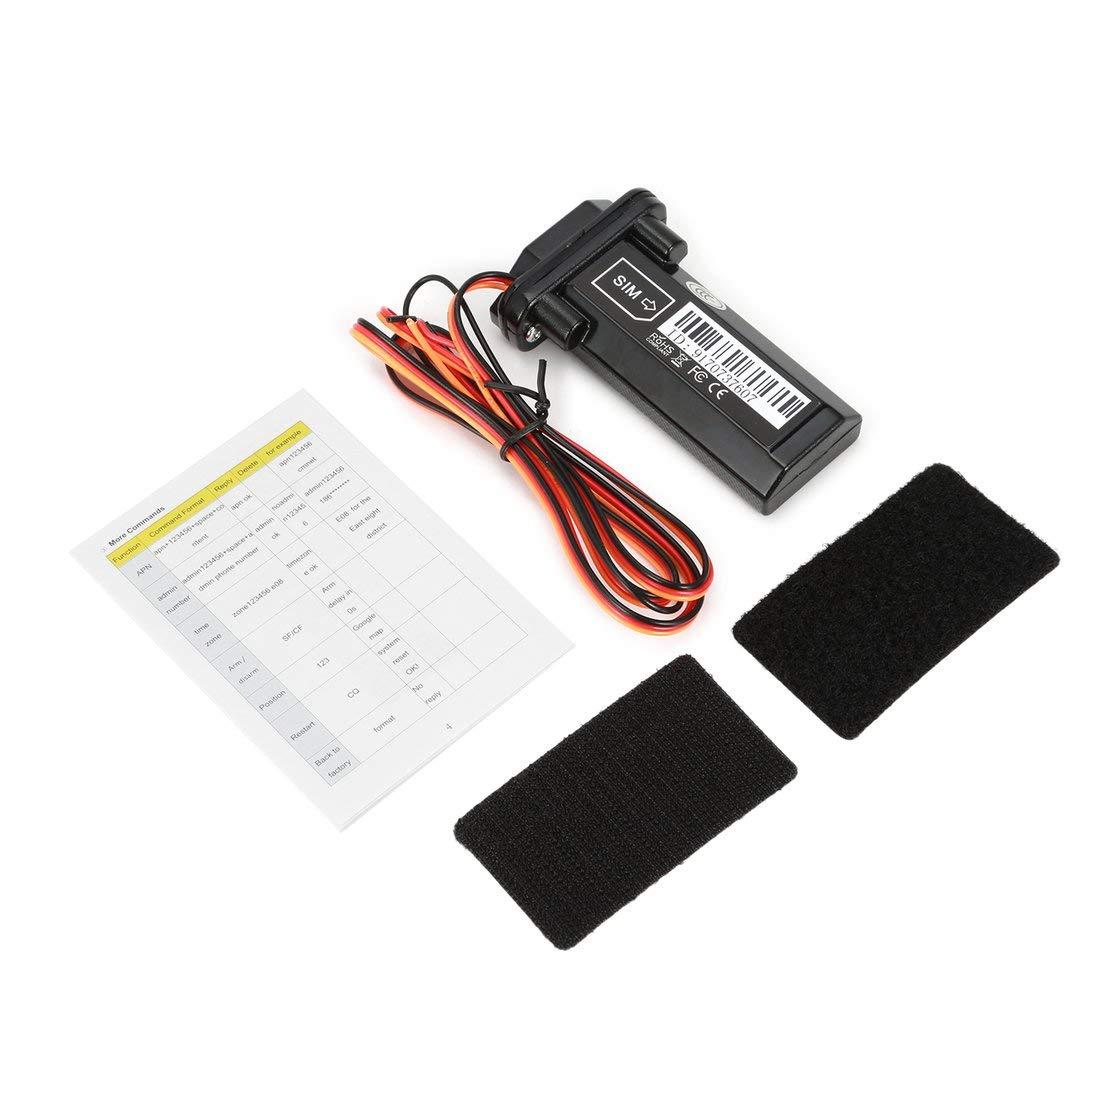 Color:Black ST-901 GT02A Mini bater/ía incorporada gsm GPS Tracker para Dispositivo de Seguimiento de veh/ículos de Motocicletas de autom/óviles con Software de Seguimiento en l/ínea Kaemma